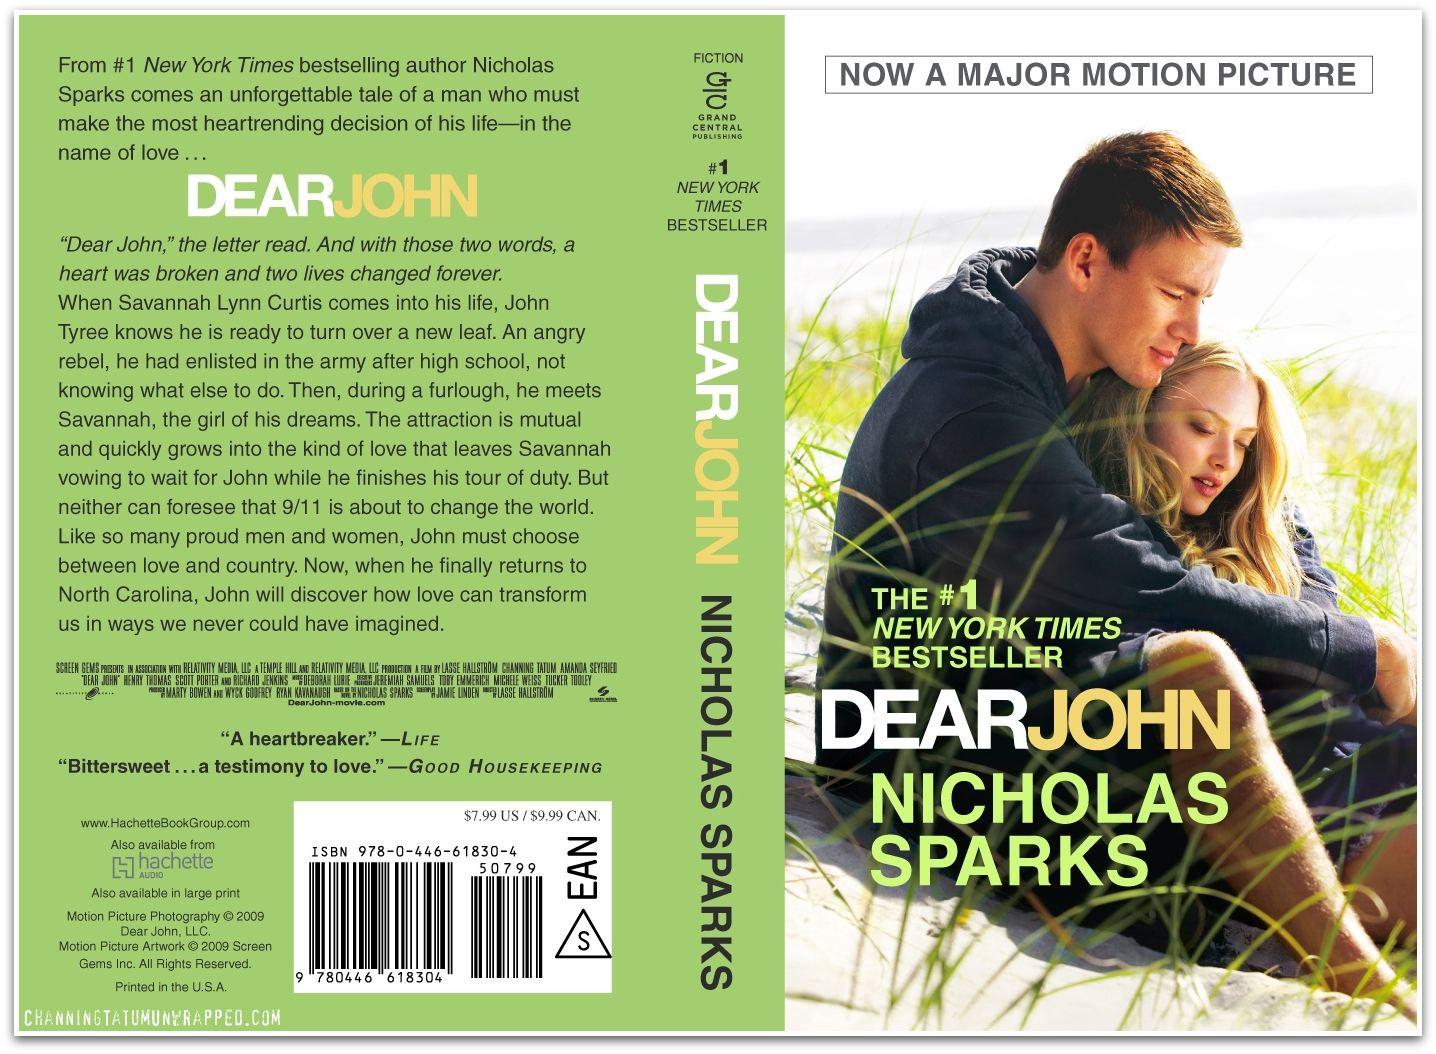 http://1.bp.blogspot.com/_k-fzMlY_H8w/S_J43NAsRdI/AAAAAAAAFK0/PIes8sDkxUk/s1600/dear-john-paperback-channing-tatum-amanda-seyfried.jpg